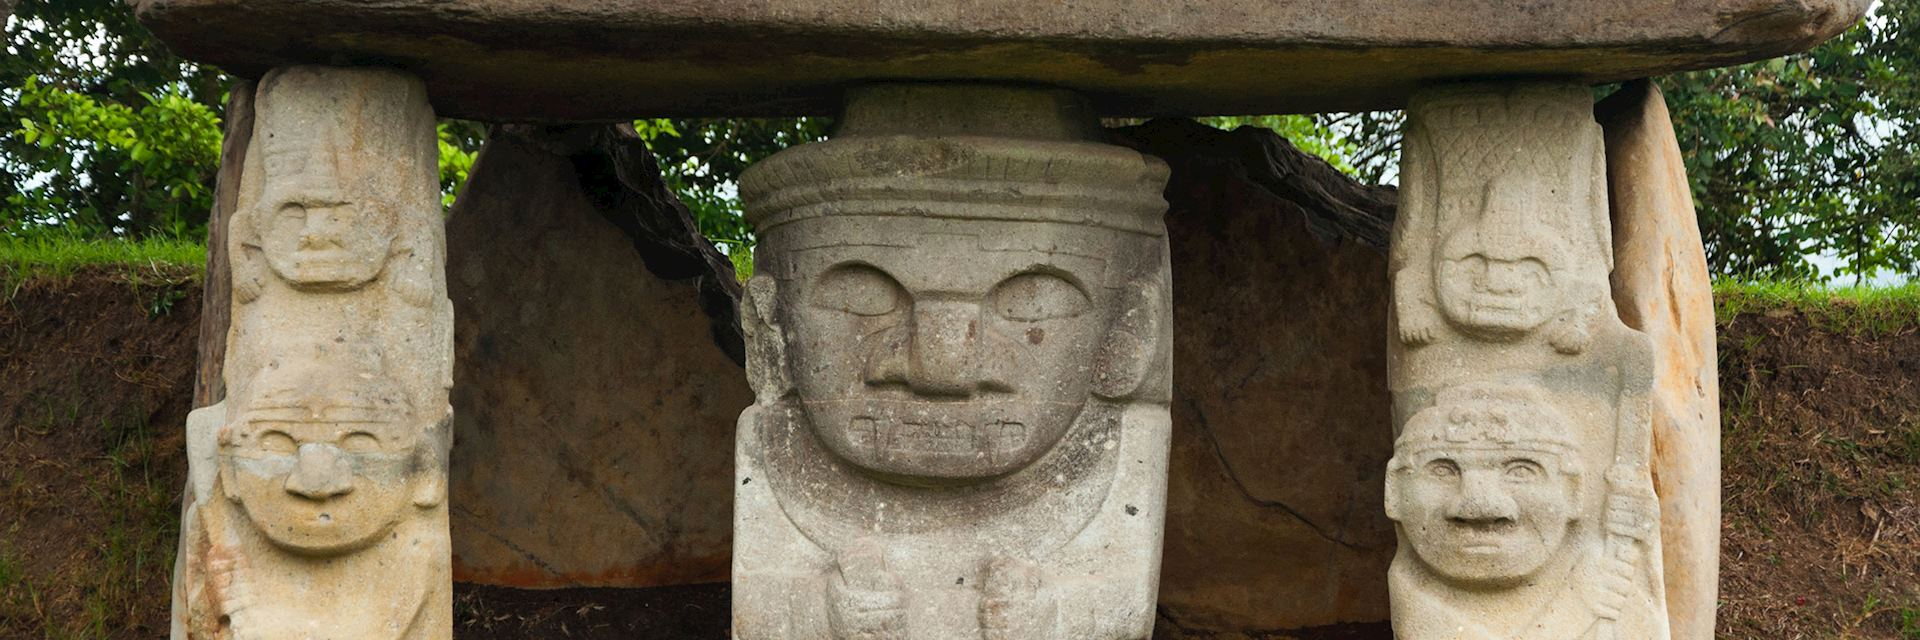 Stone statues at San Agustin